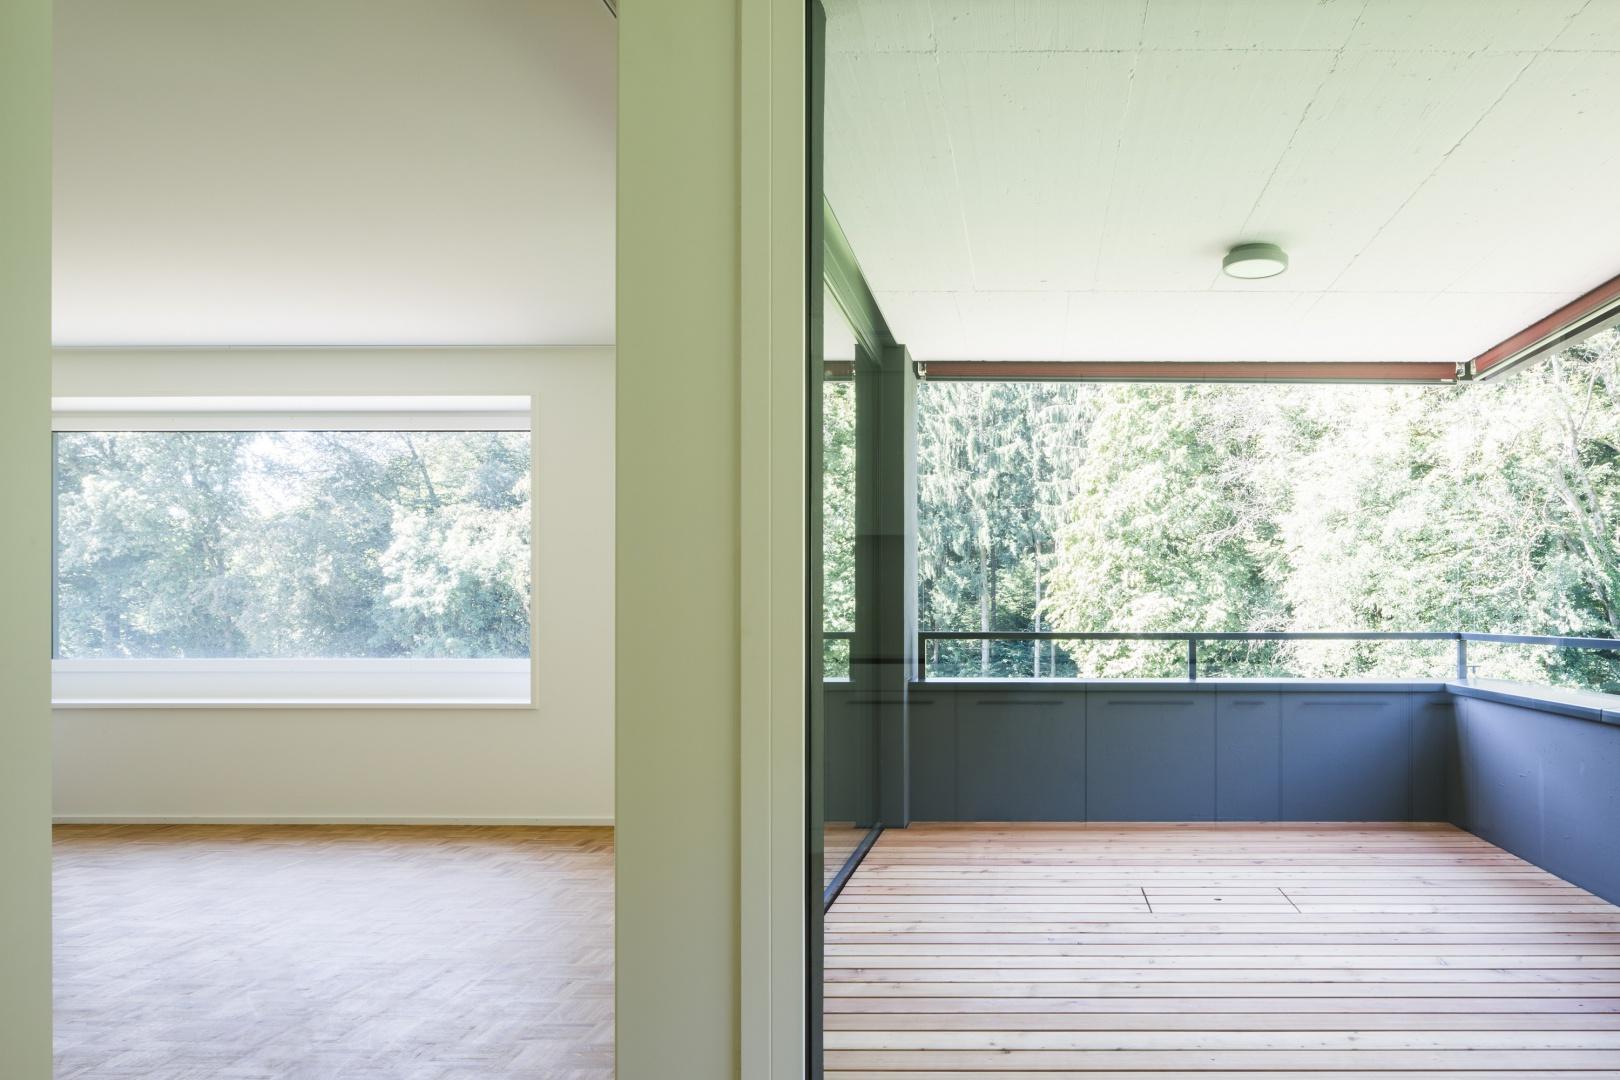 © Architektur: Bob Gysin Partner BGP, Zürich; Fotografie: Dominique Marc Wehrli, Winterthur